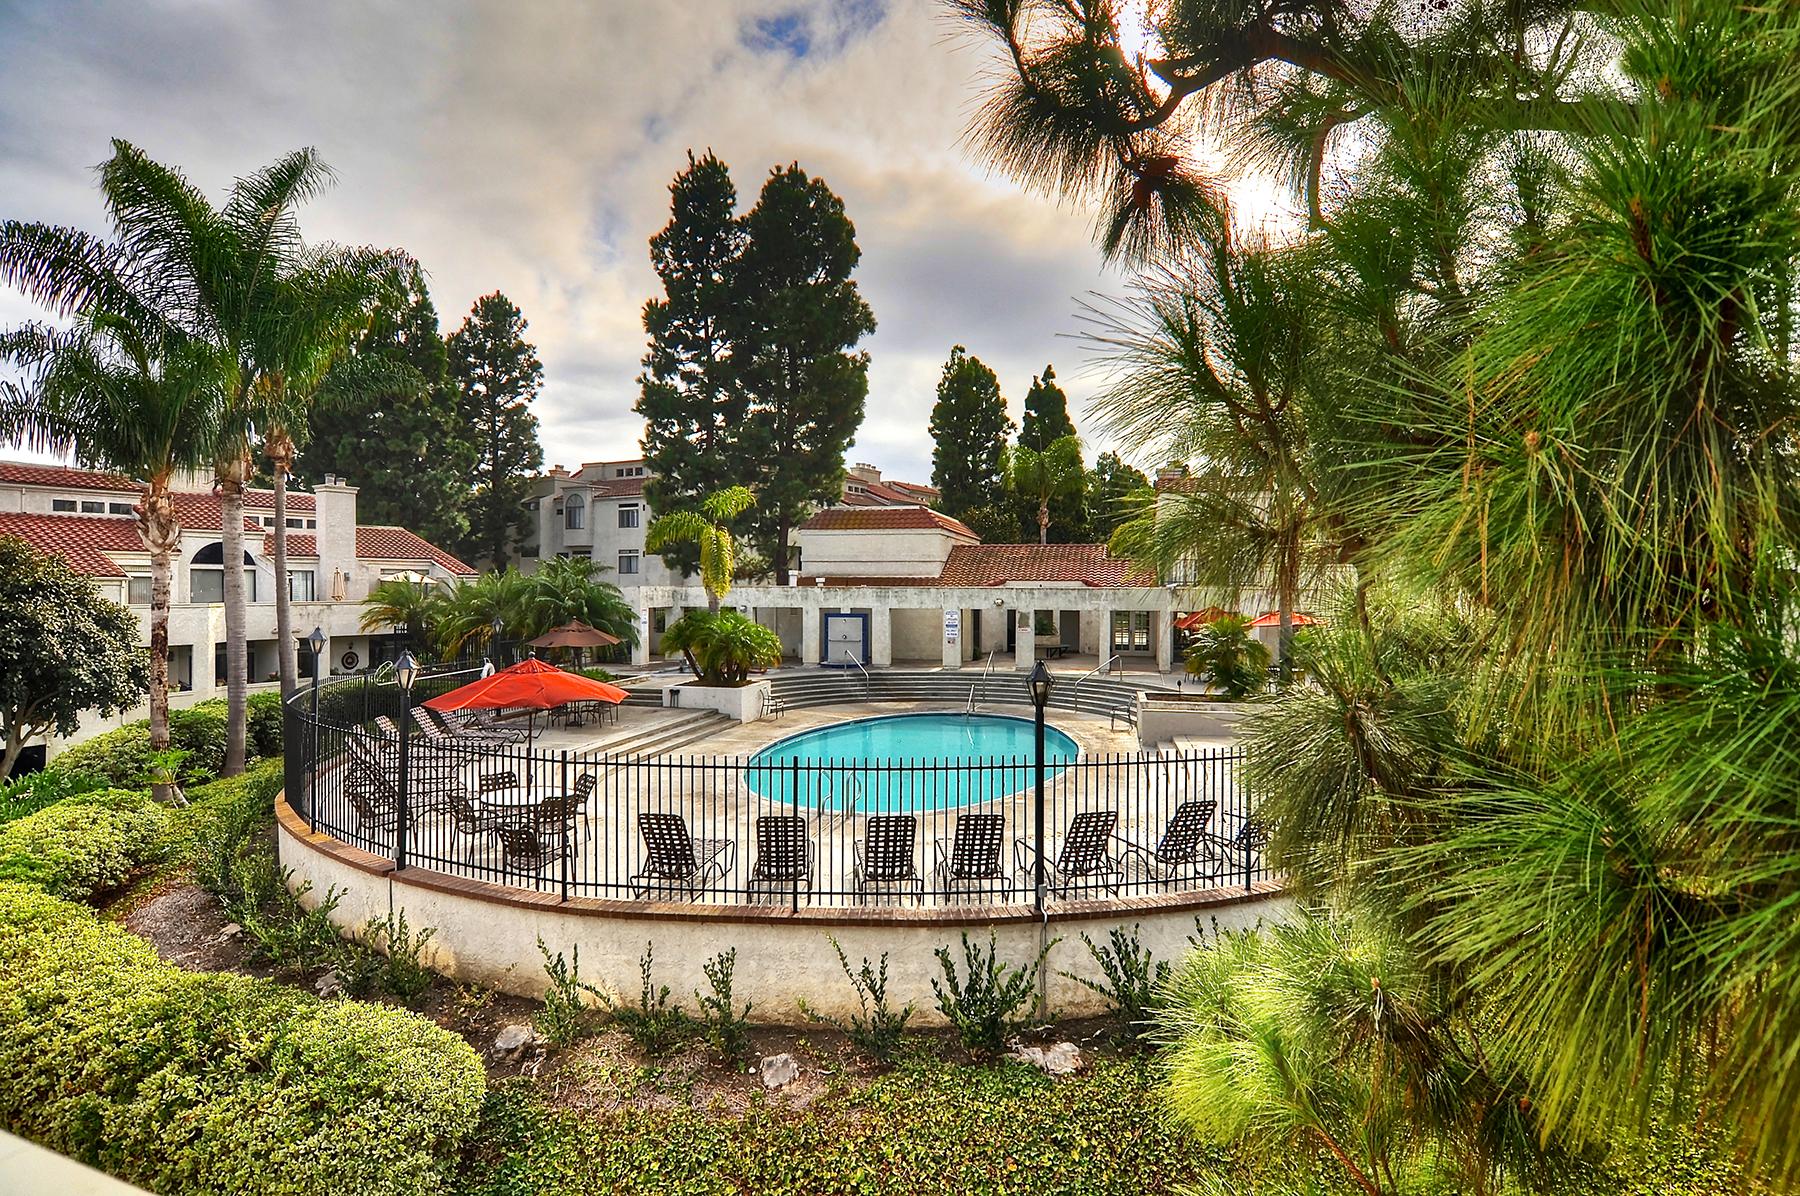 Condominium for Sale at 17191 Corbina #210 Huntington Beach, California 92649 United States